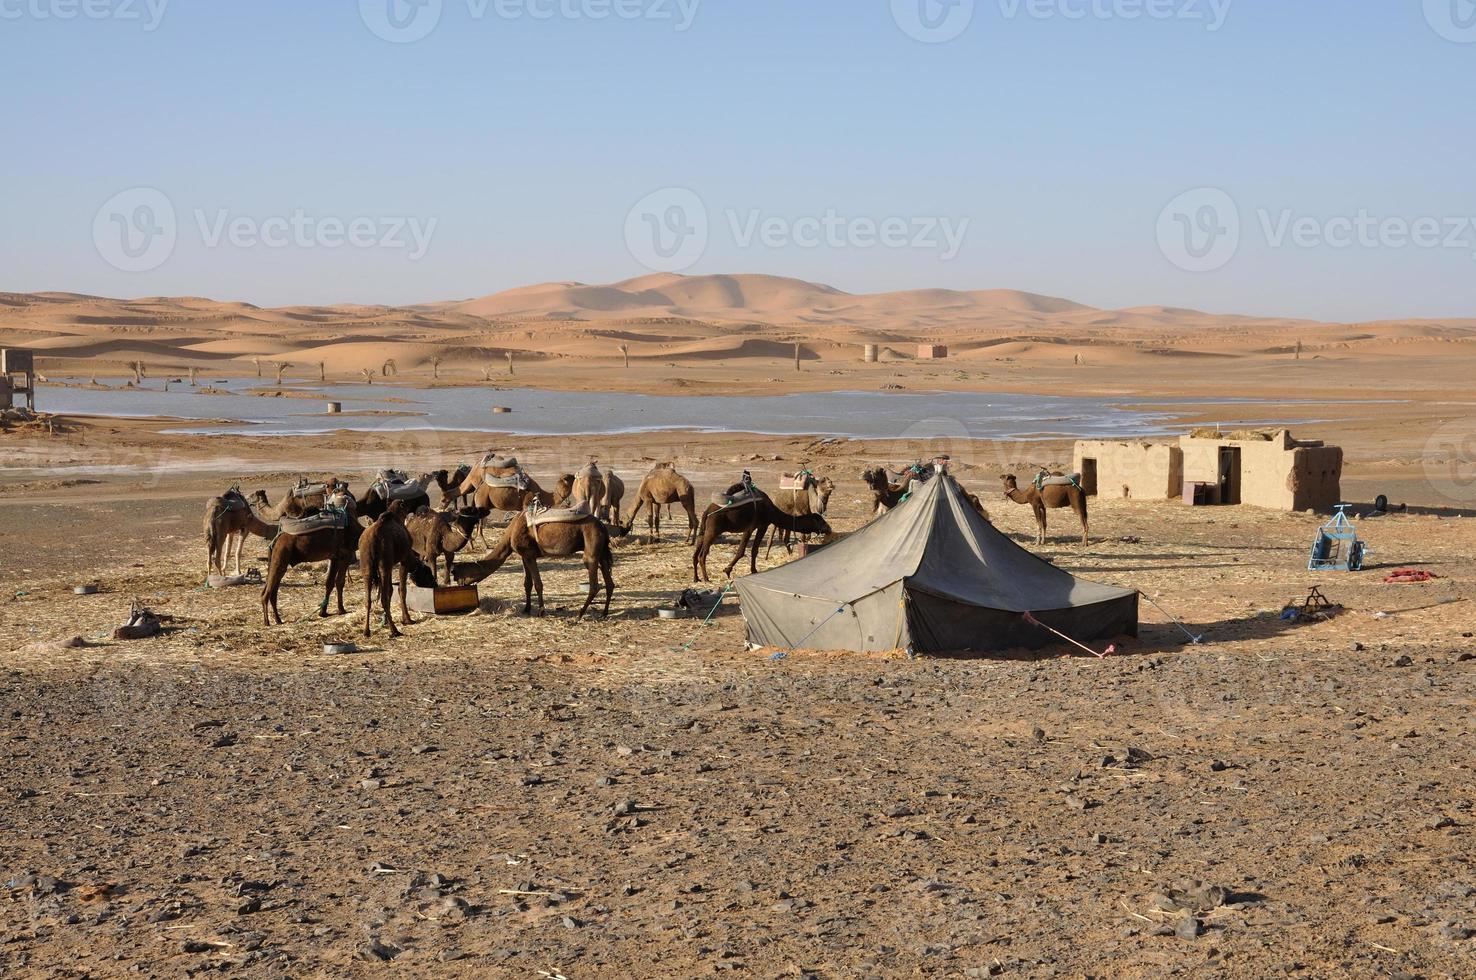 camelos no oásis, deserto do saara foto